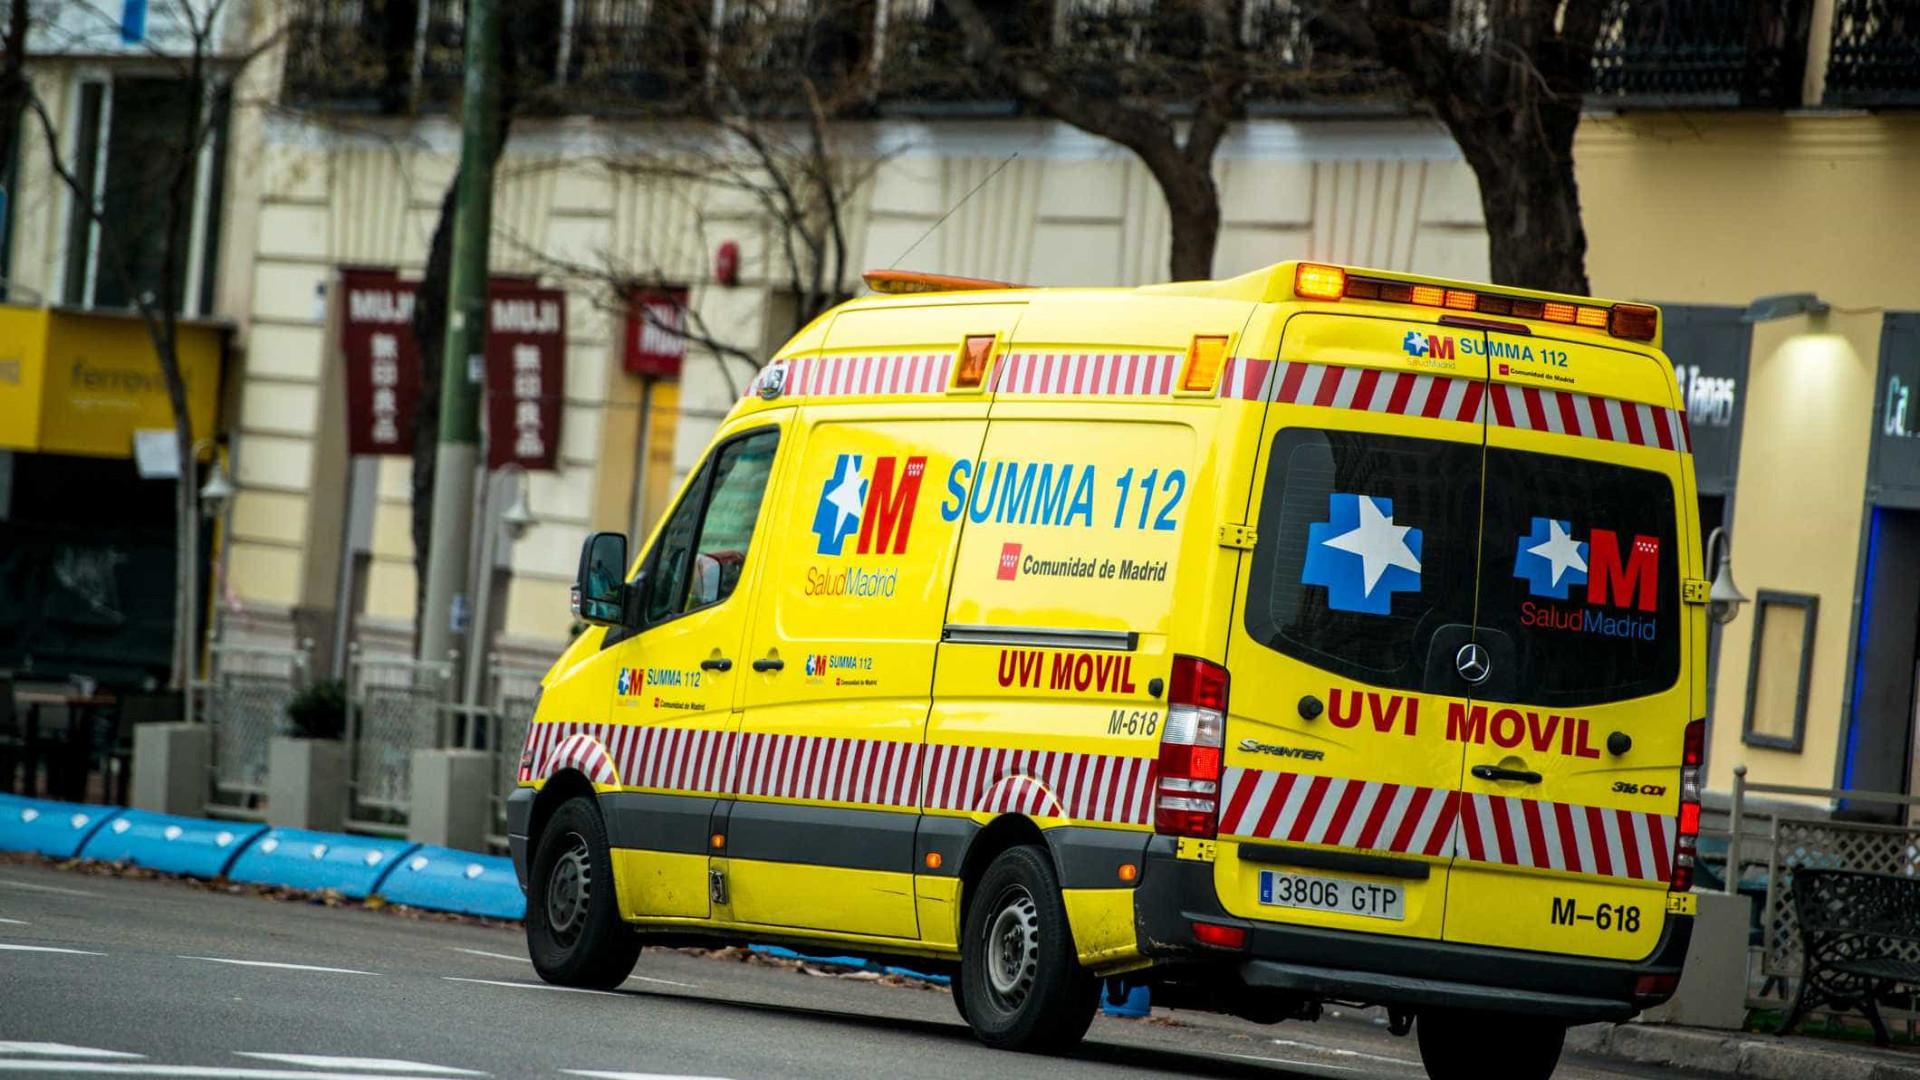 Jovens morrem após queda de varanda na Espanha